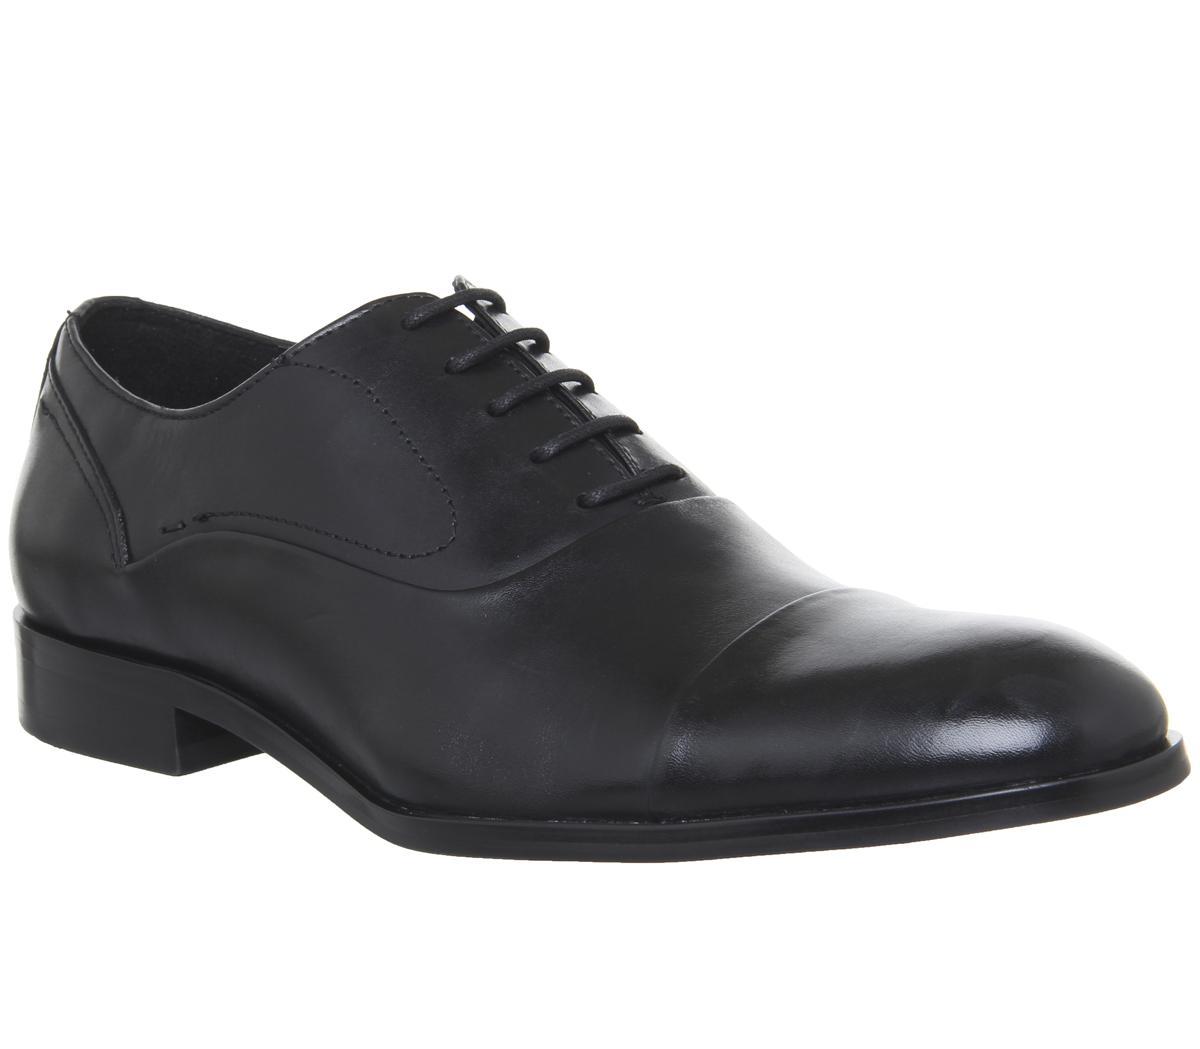 Invent Oxford Toecap Shoes